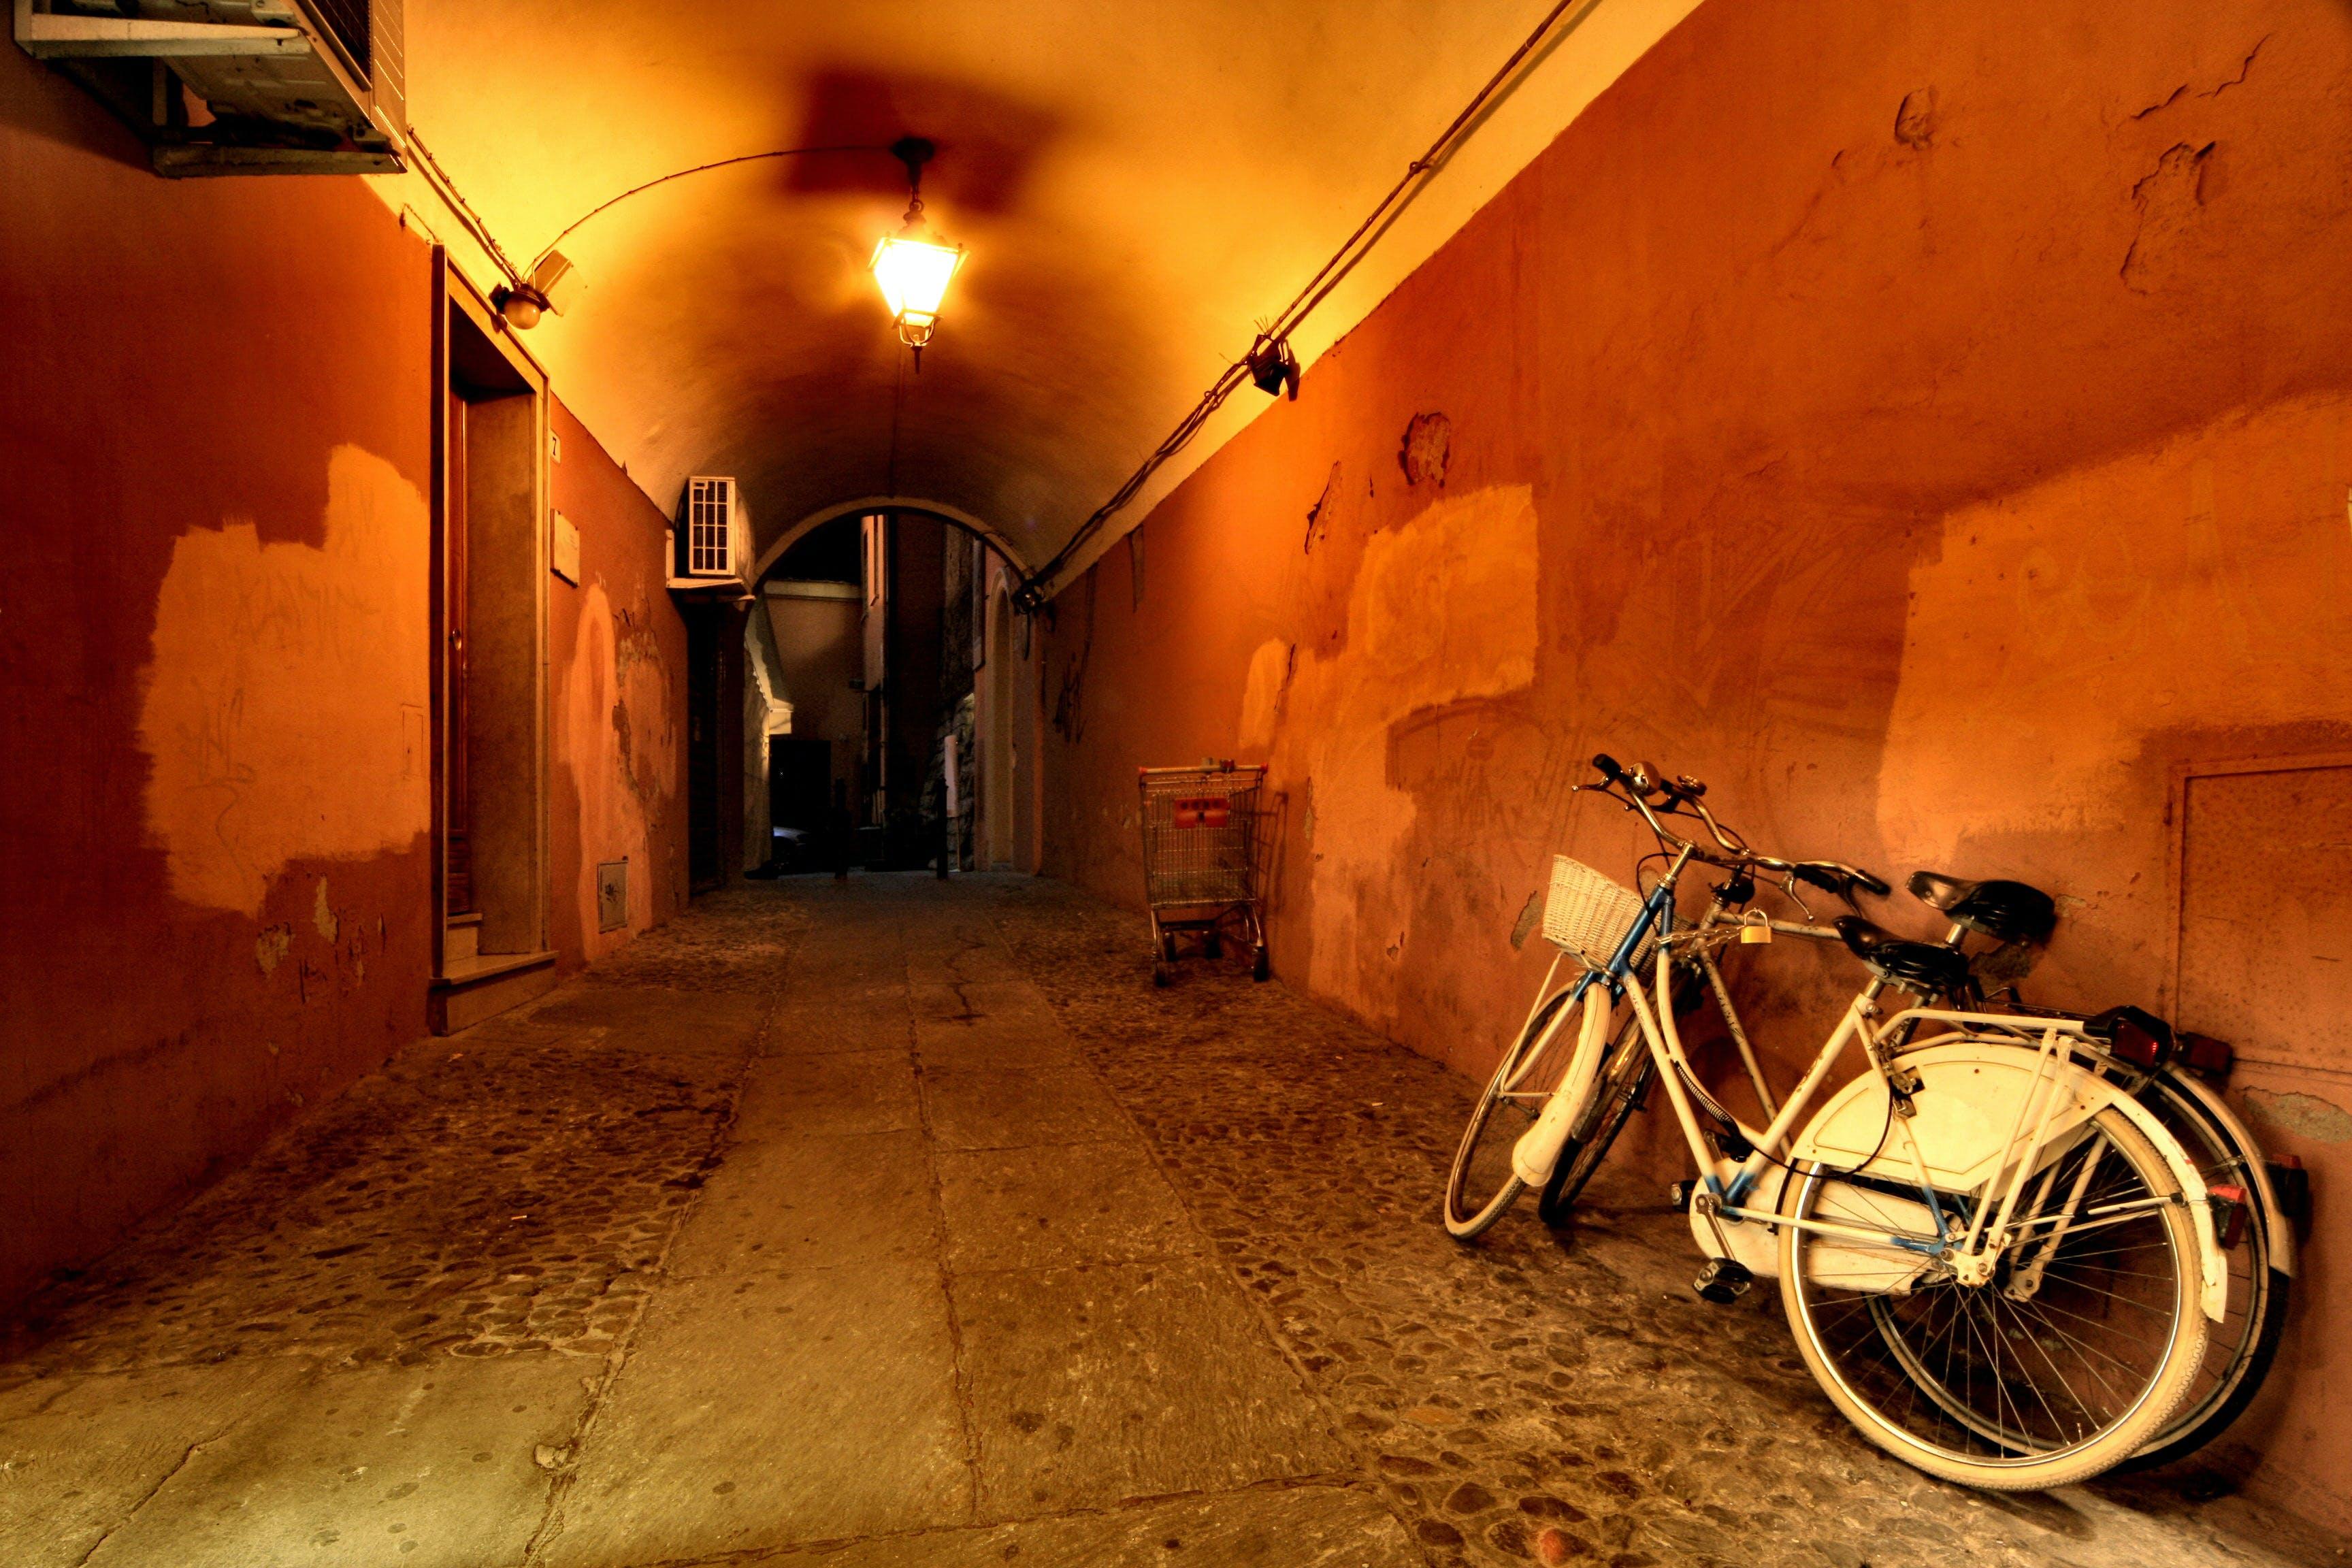 Kostenloses Stock Foto zu architektur, bologna, fahrräder, flur